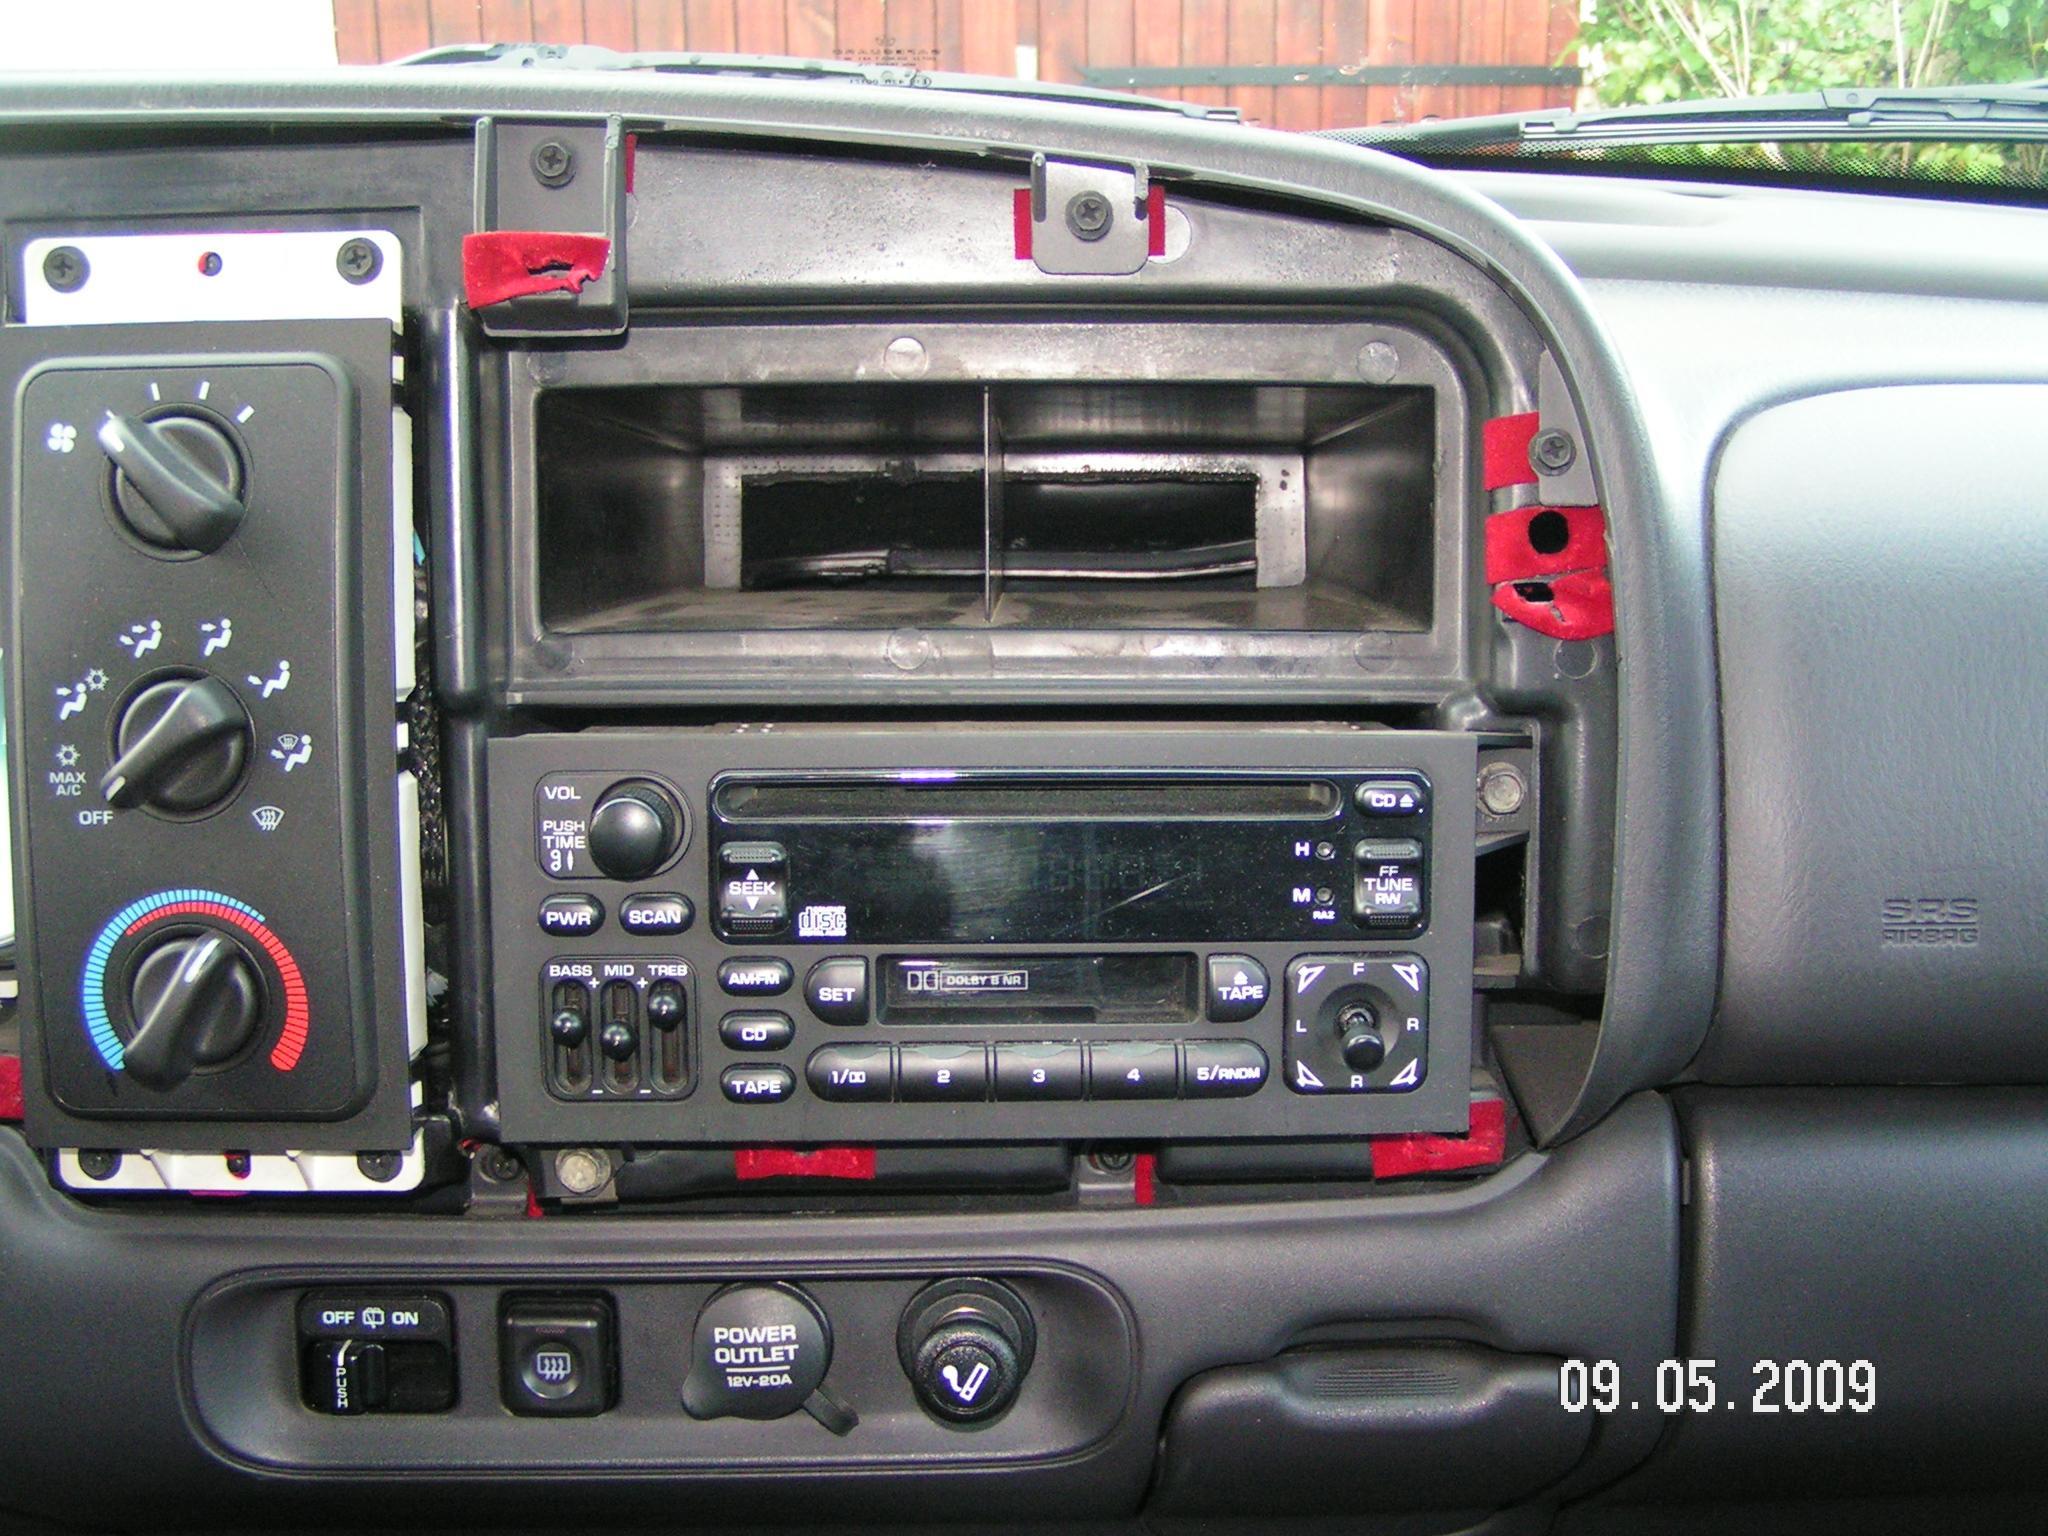 Admirable Craig Car Stereo Wiring Harness Circuit Diagram Template Wiring 101 Akebretraxxcnl